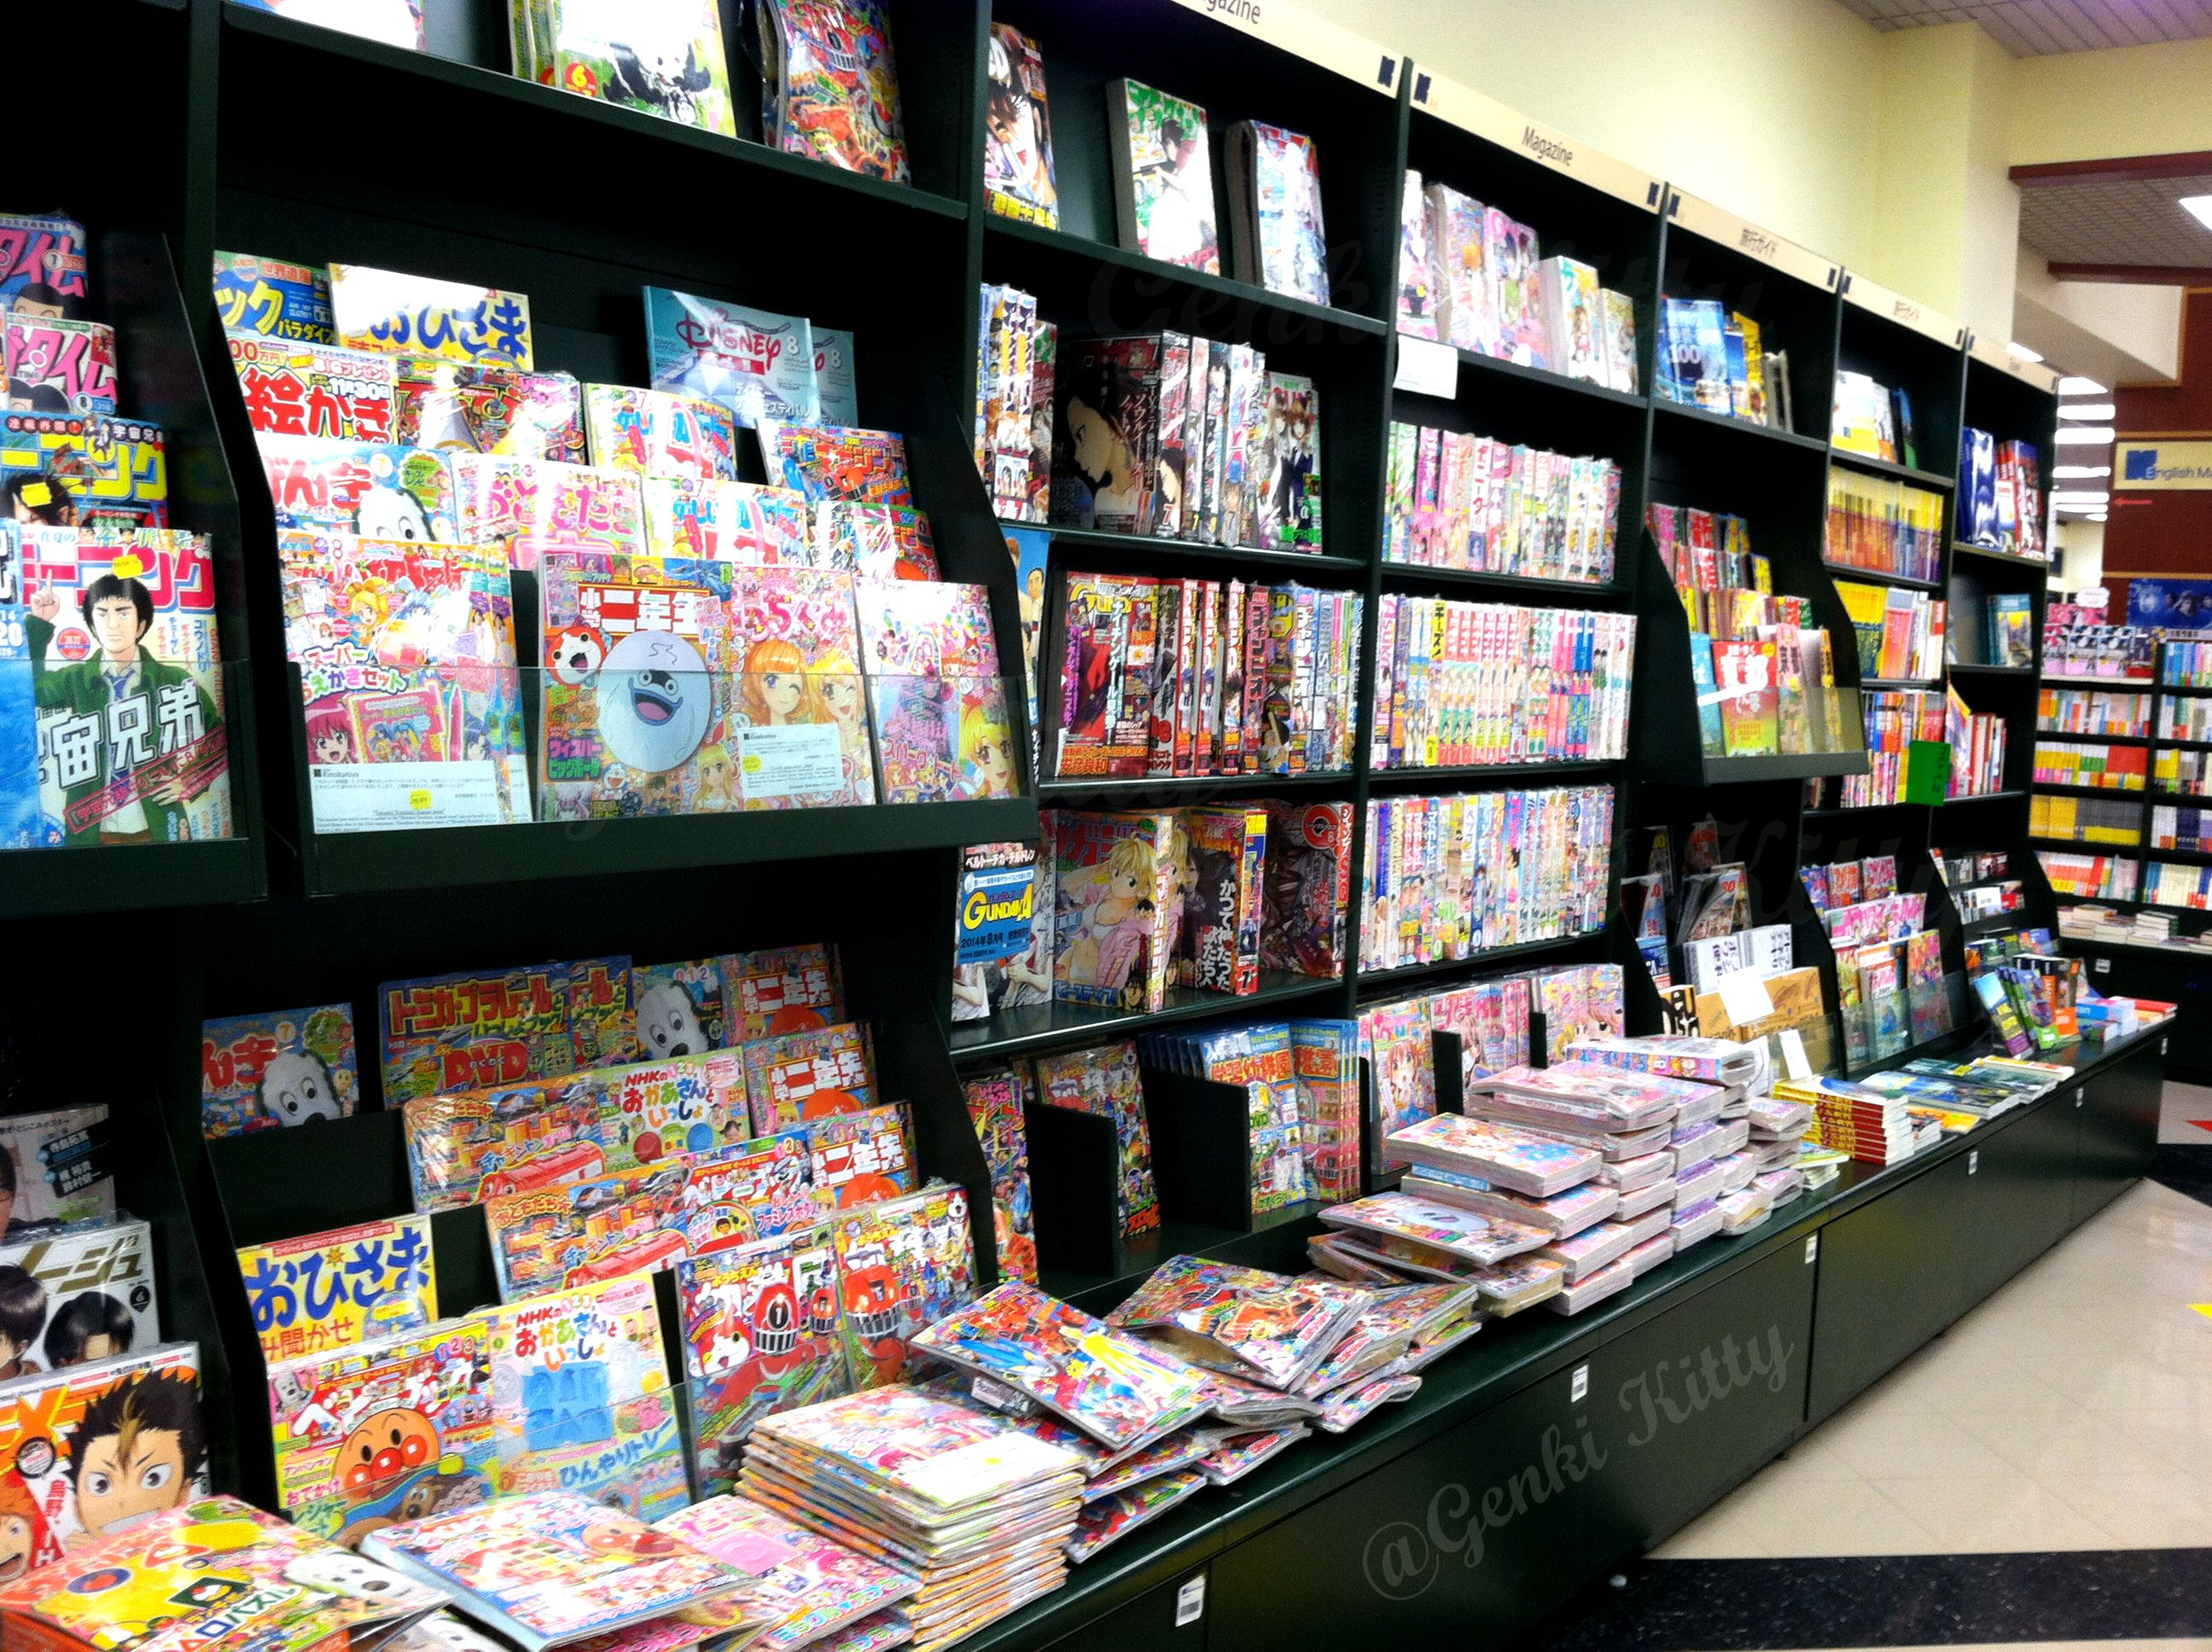 Tarba Mobili ~ Chicago bound again: vegan travels chicago and manga books